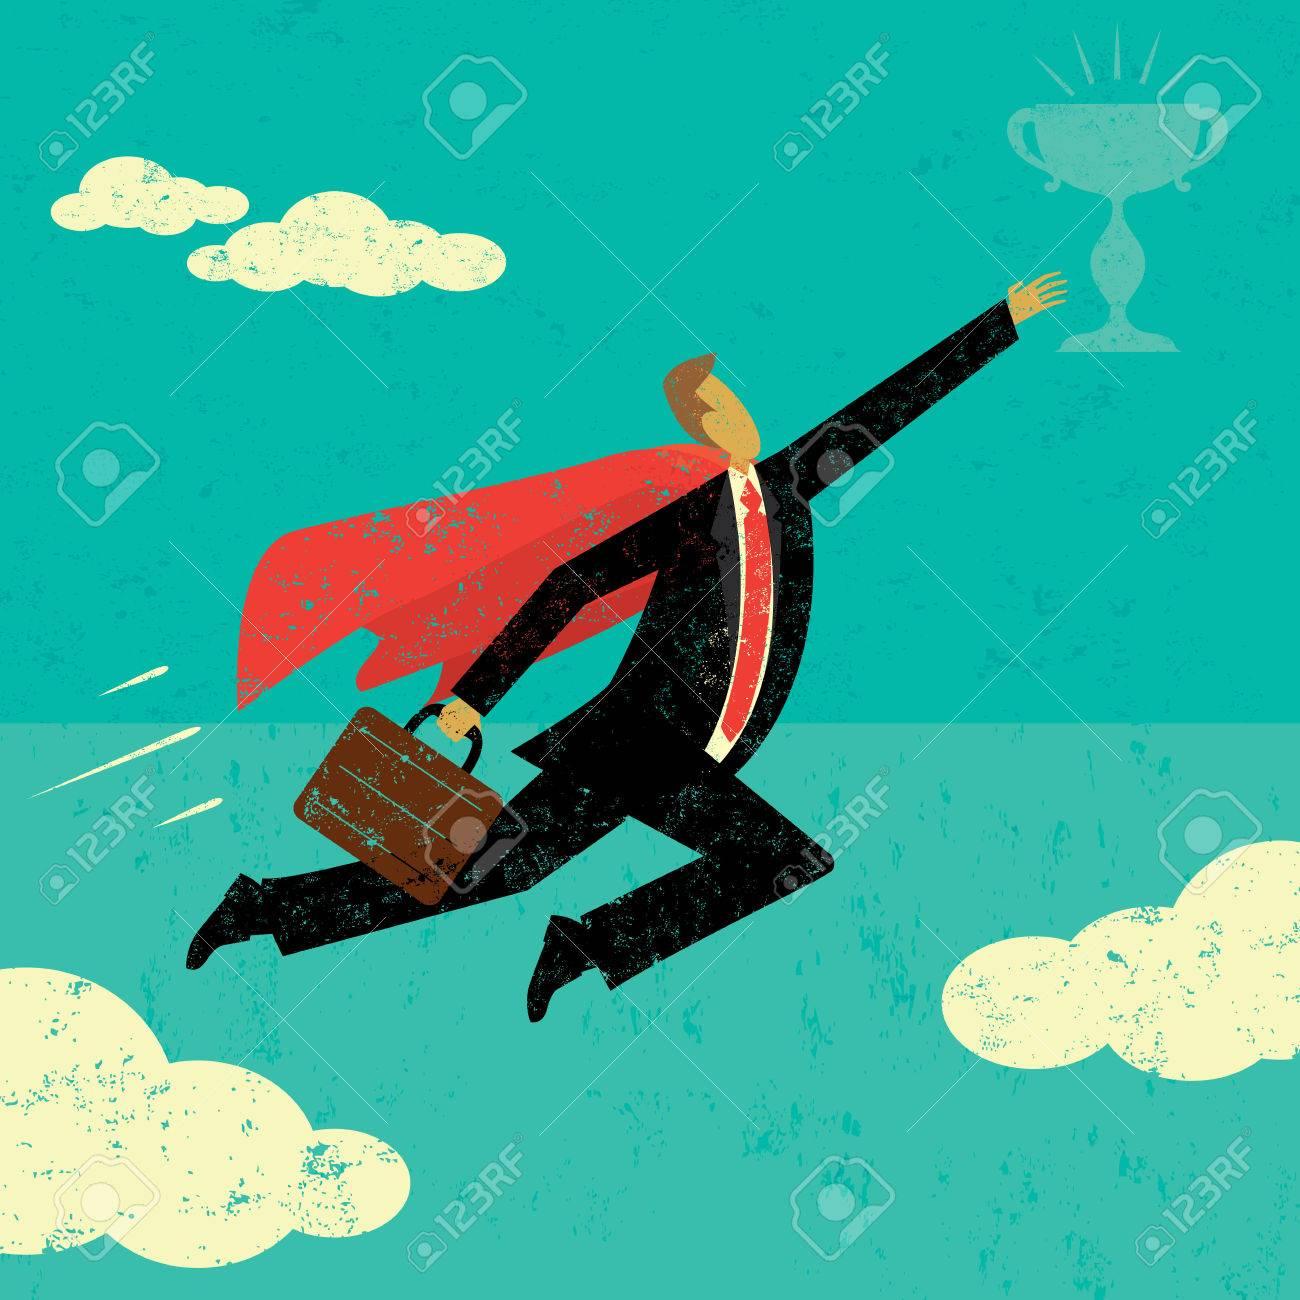 Super Businessman - 36475535